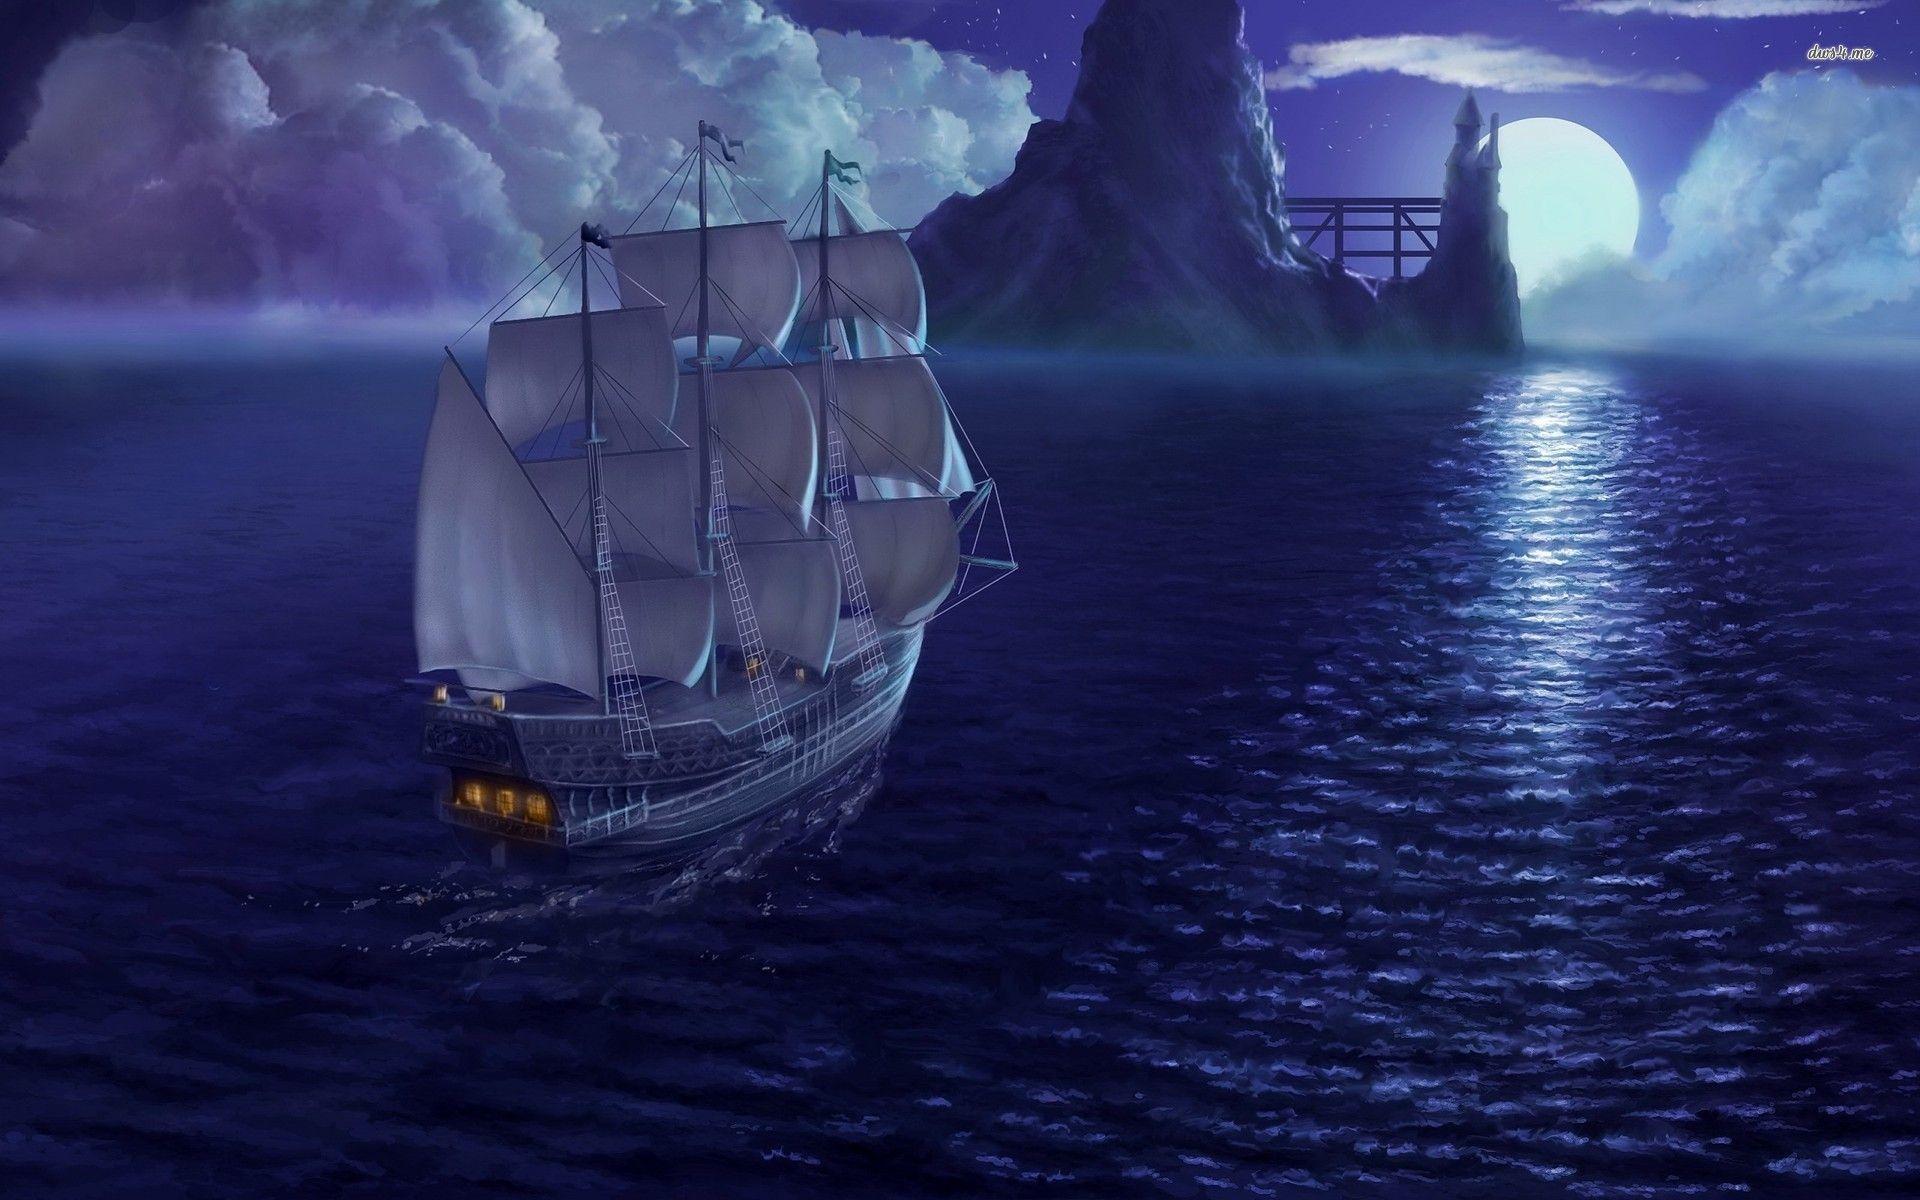 Tall Ship Wallpapers - Wallpaper Cave